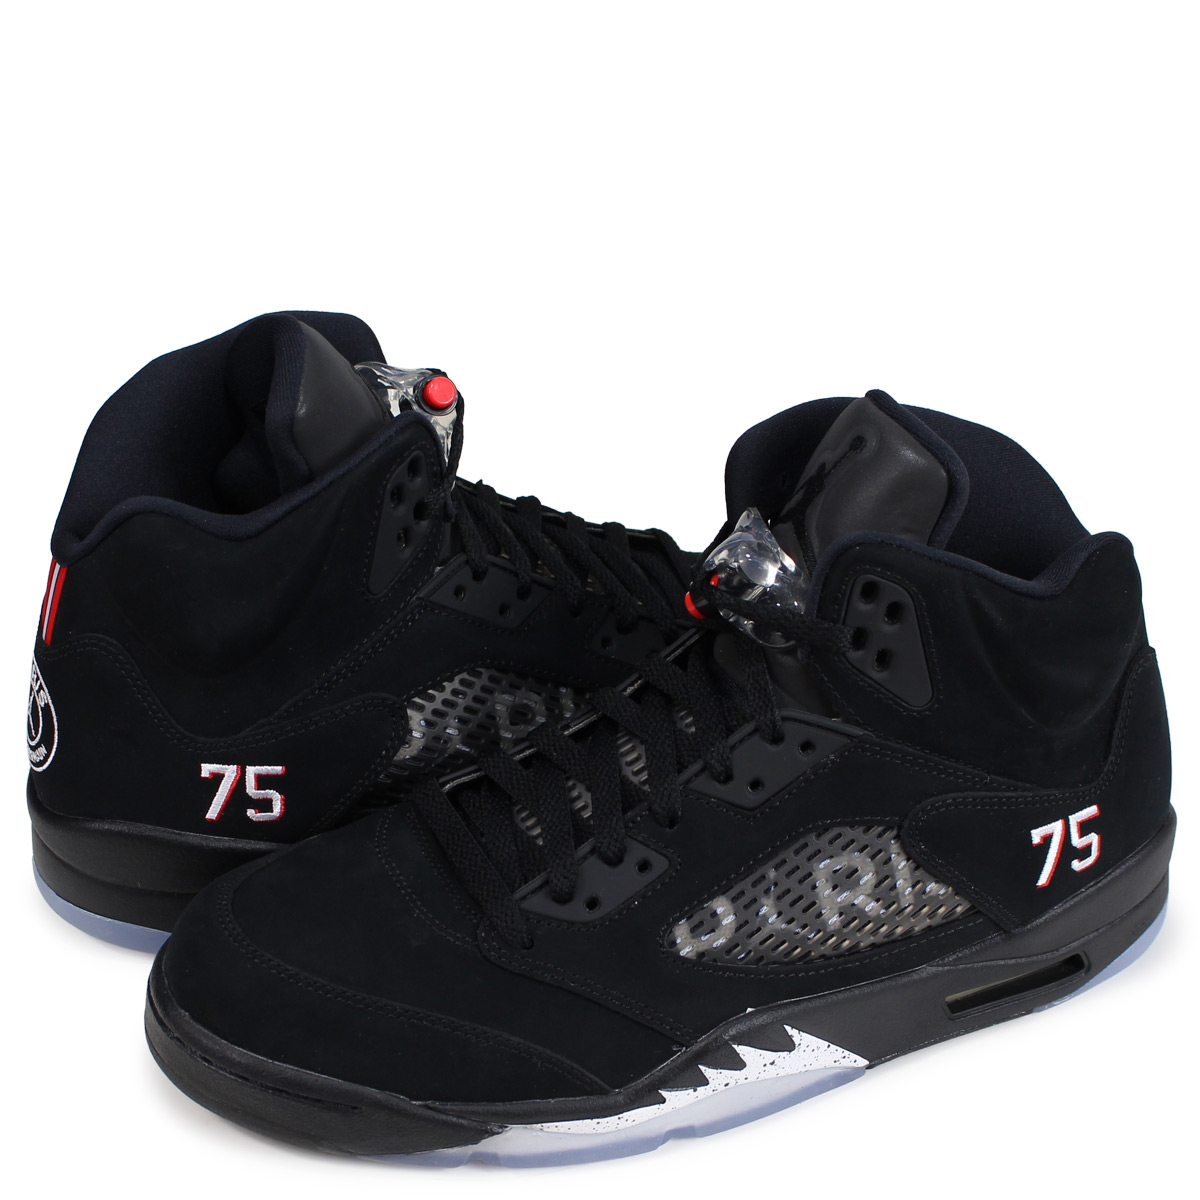 check out be181 31f76 ALLSPORTS  Nike NIKE Air Jordan 5 nostalgic sneakers men AIR JORDAN 5 RETRO  BCFC PSG black AV9175-001   Rakuten Global Market